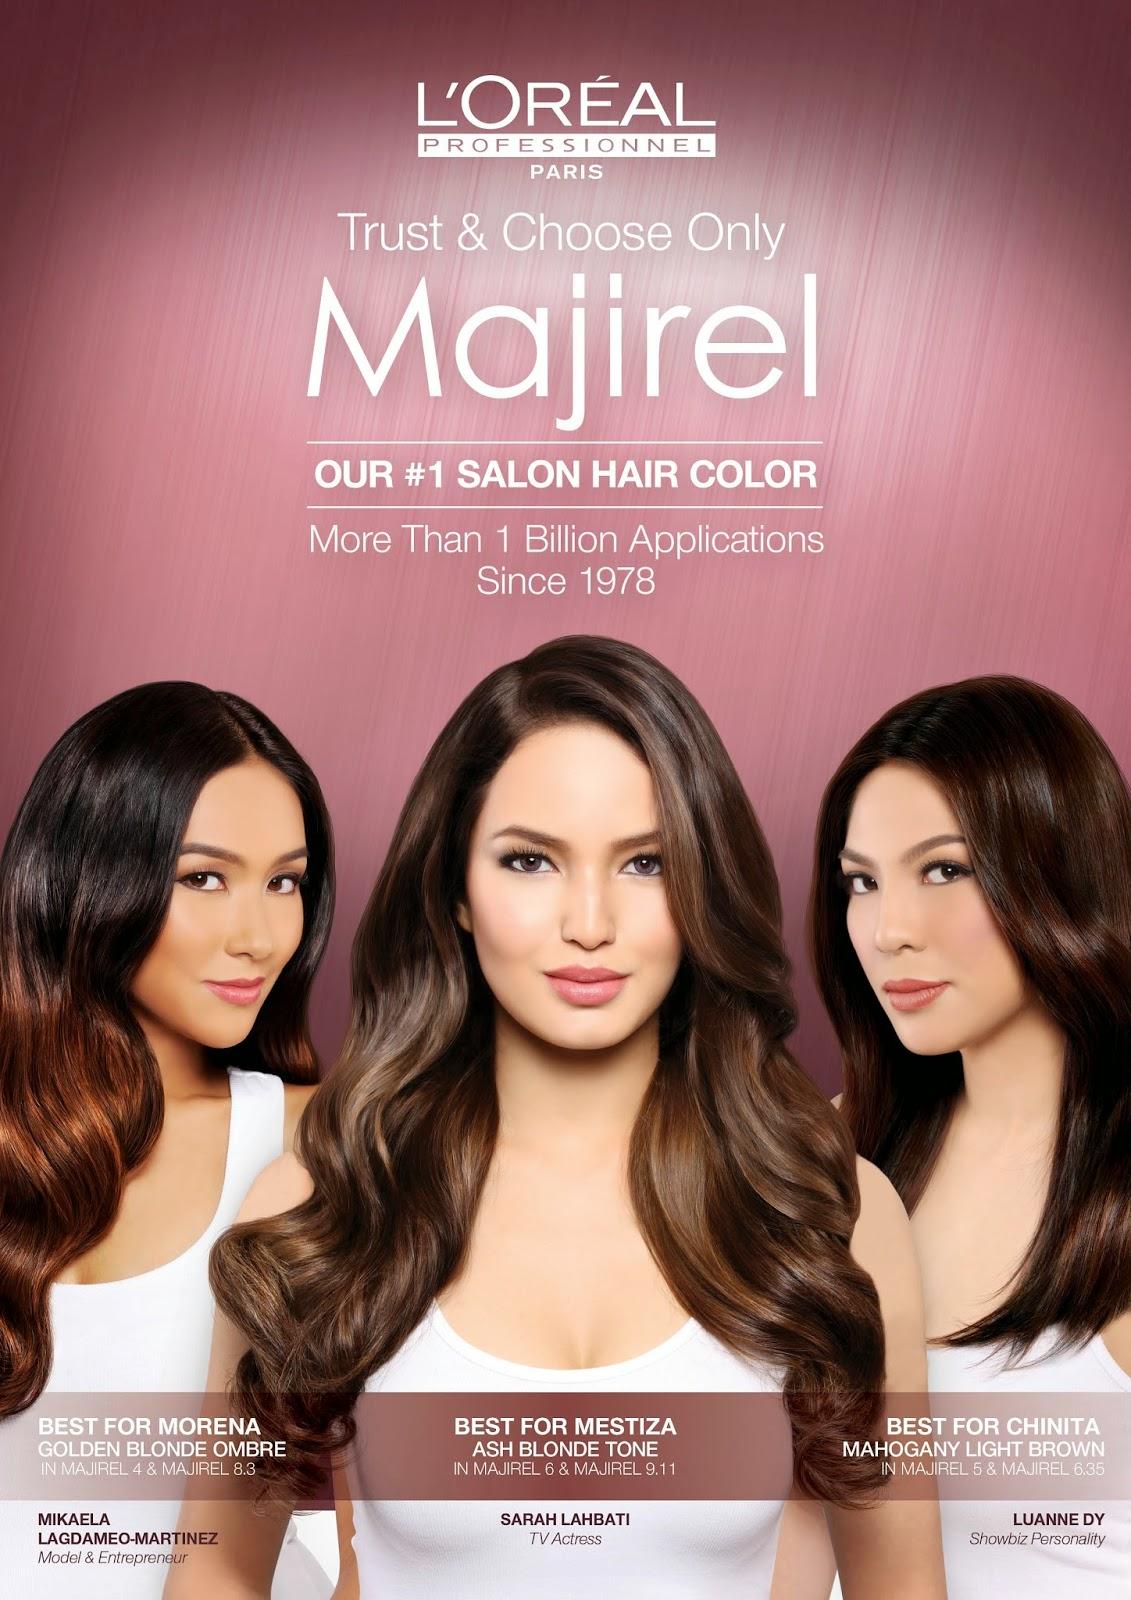 Loral Professionnel Majirel Unveils Its Filipina Endorsers Sarah